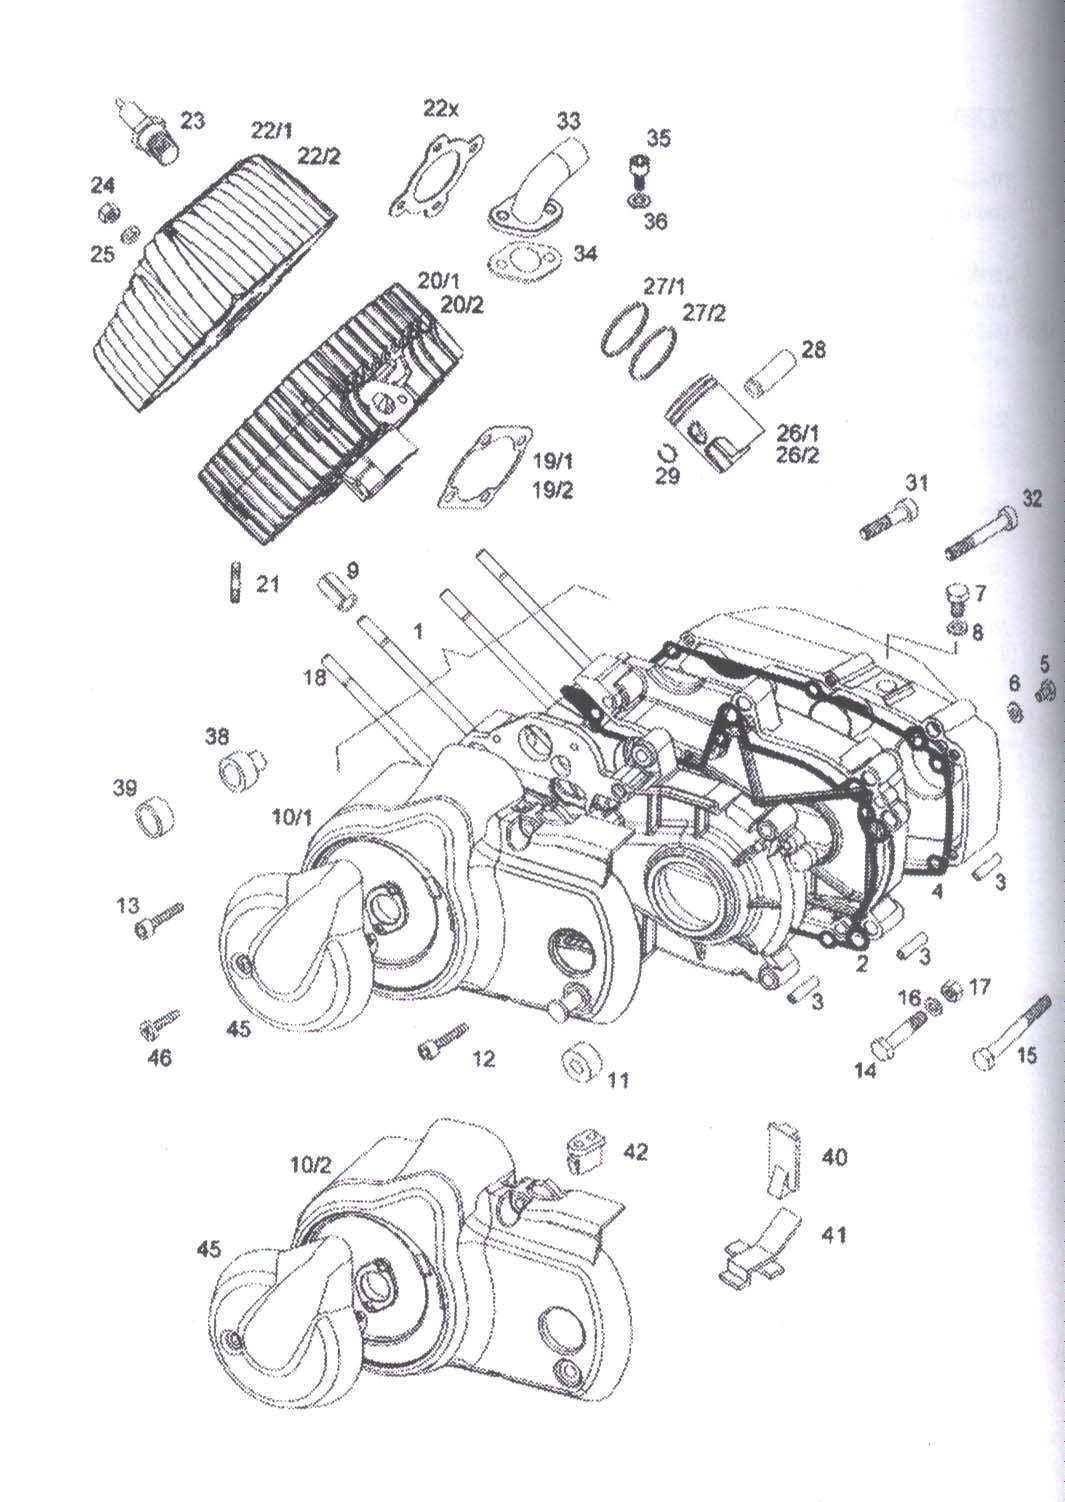 A55 Engine Parts